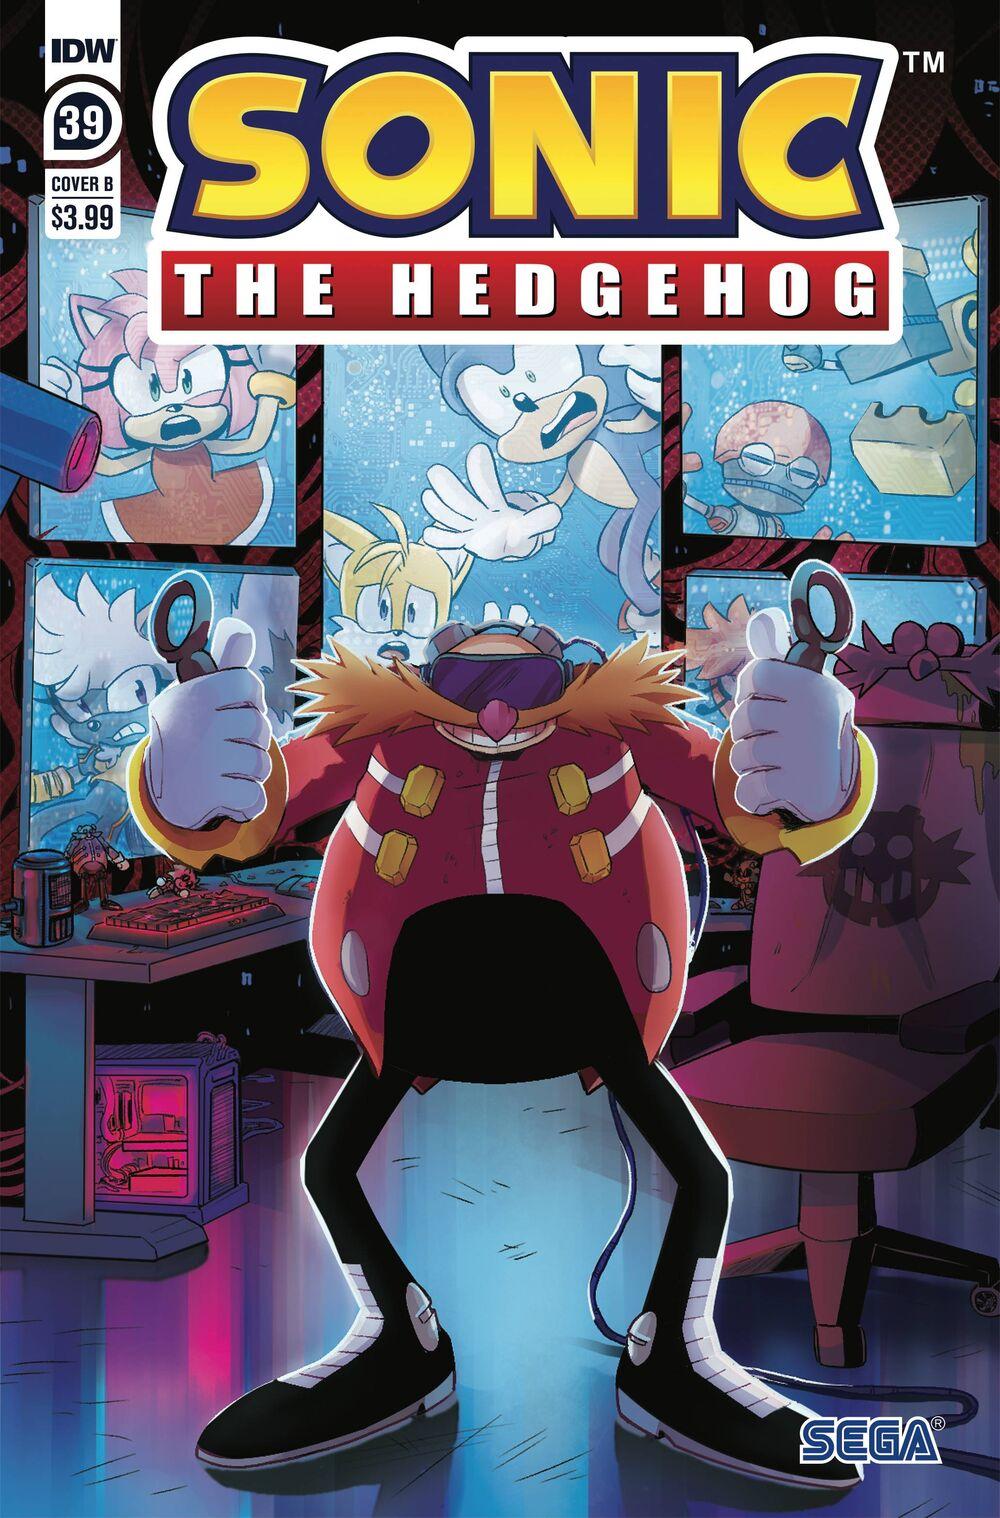 Sonic The Hedgehog #39 Cover B